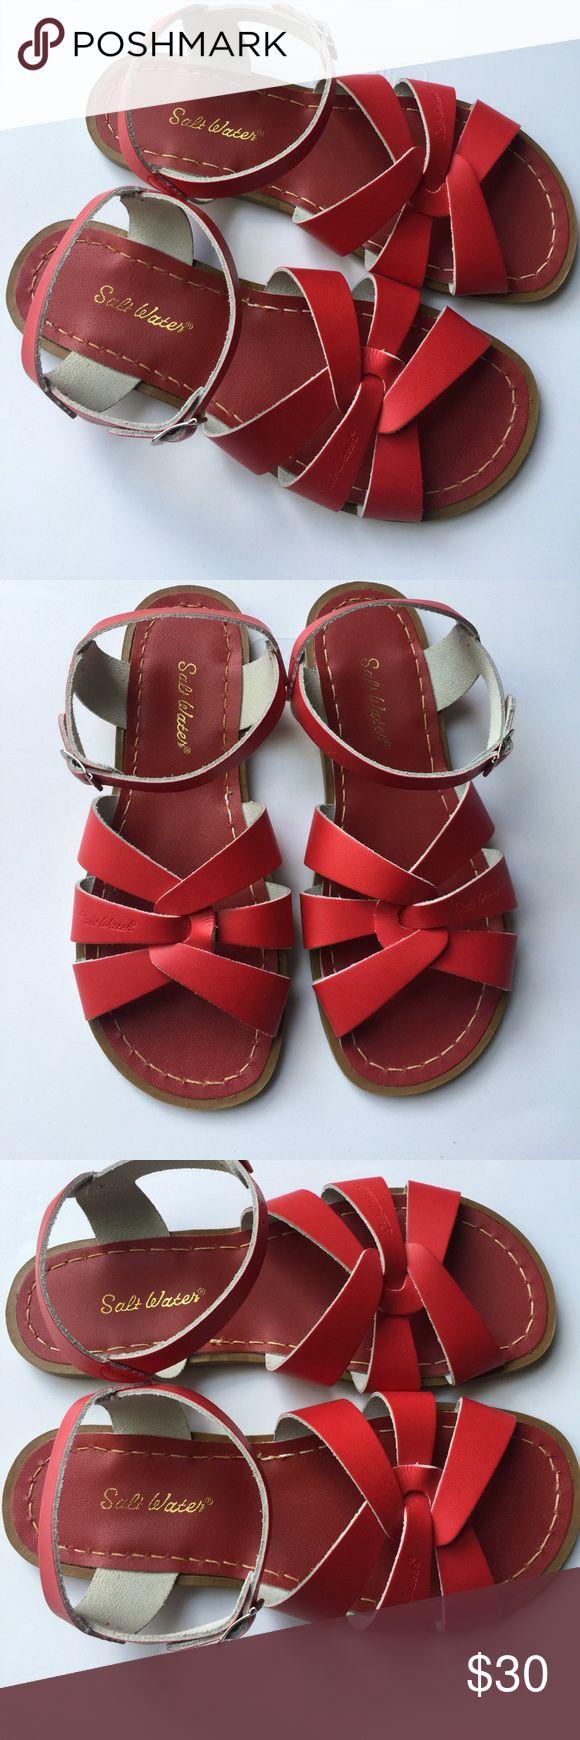 Salt water Women's Size 9 red sandals EUC no flaws Size 9 US Salt Water Sandals by Hoy Shoes Sandals